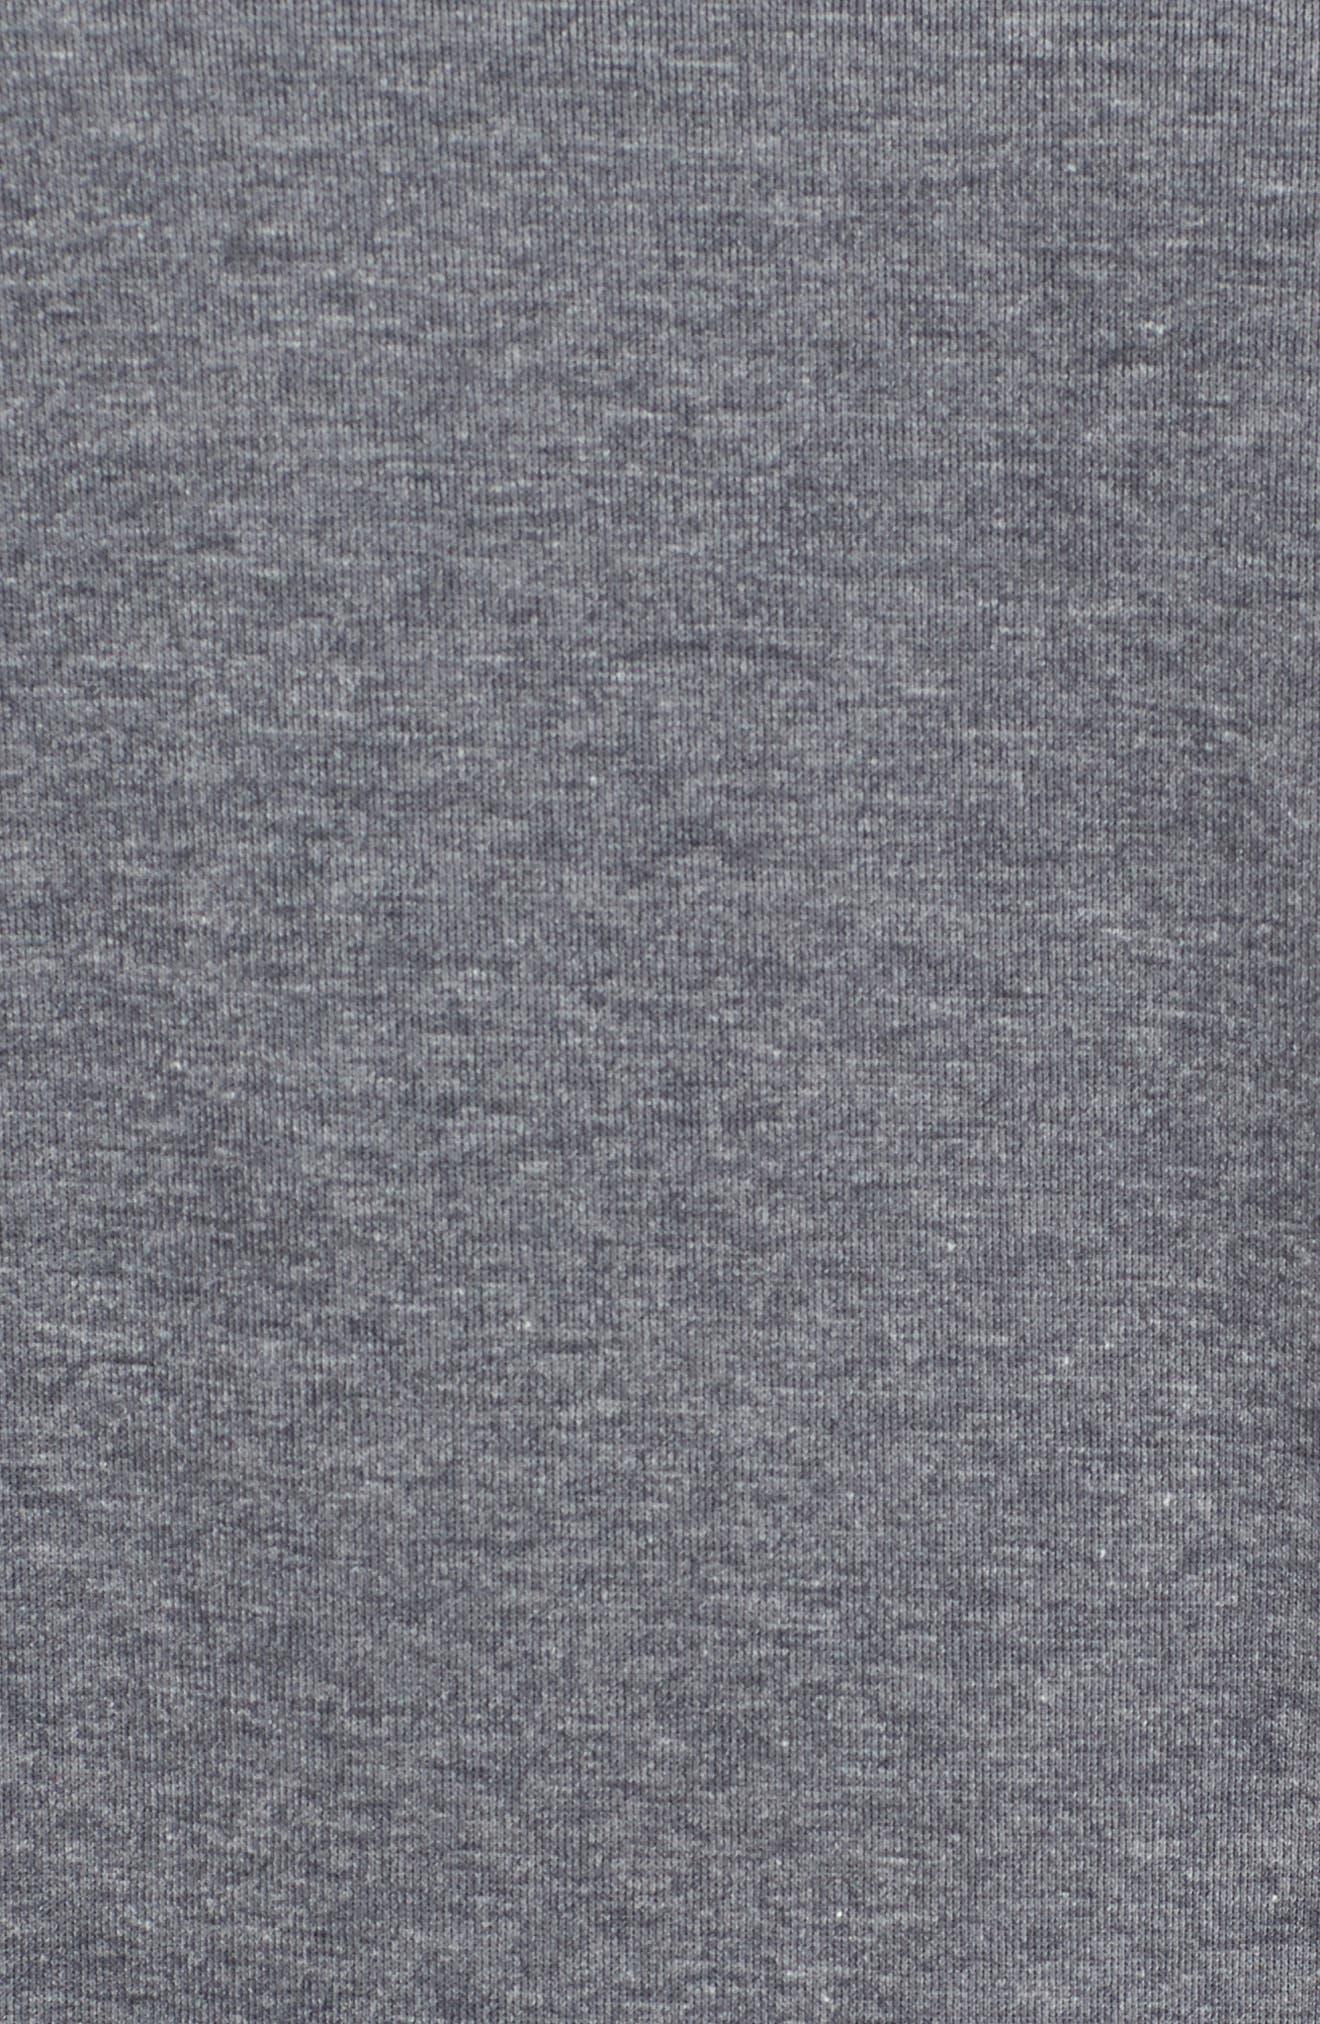 Oversize Sweatshirt,                             Alternate thumbnail 6, color,                             Dark Grey Heather